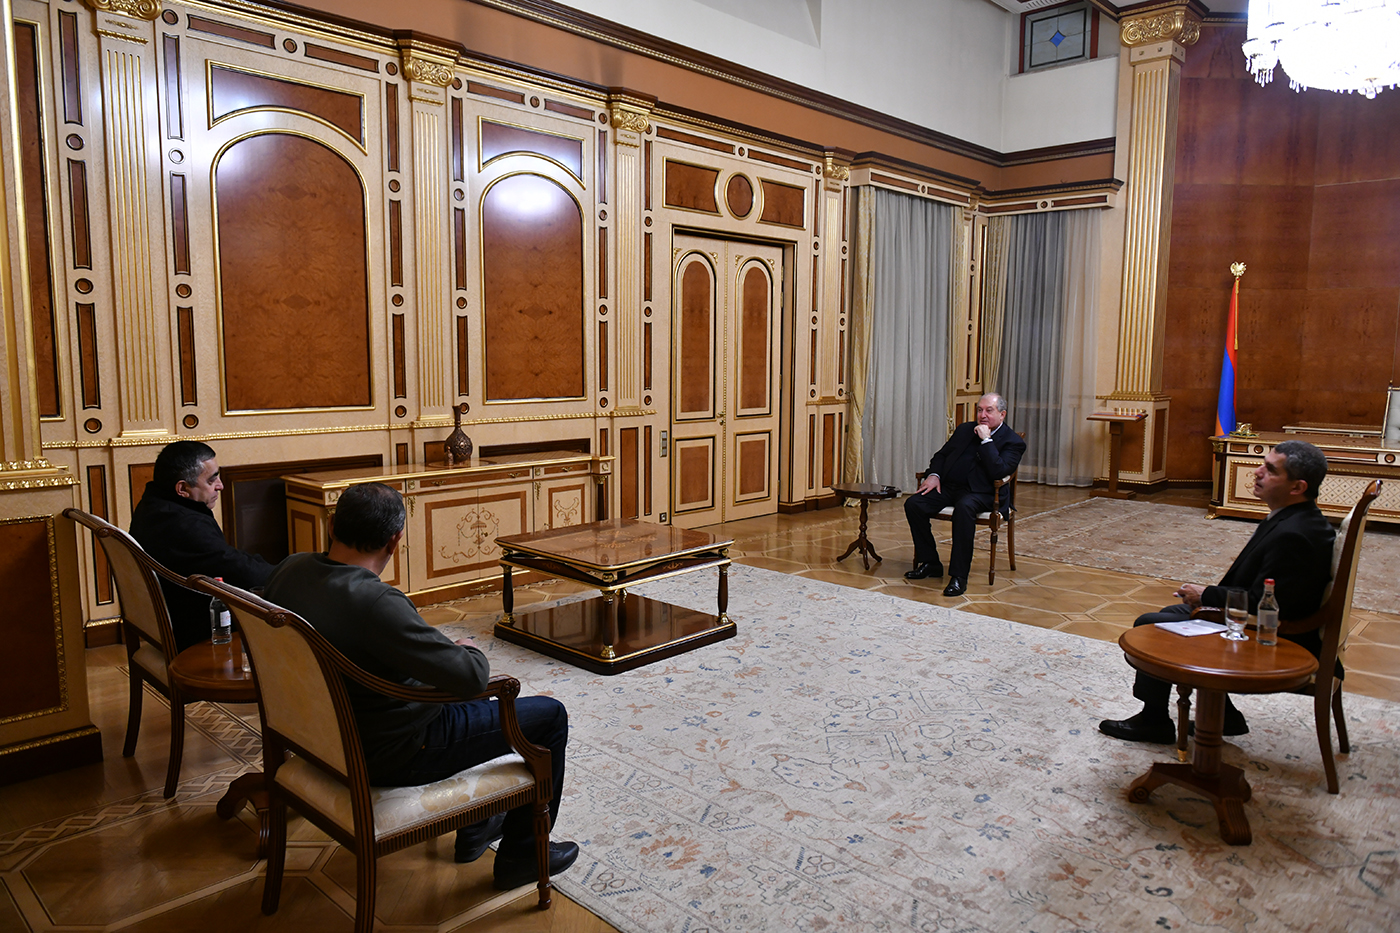 Photo of Նախագահ Արմեն Սարգսյանը քաղաքական խորհրդակցություններ է նախաձեռնել խորհրդարանական և արտախորհրդարանական ուժերի հետ